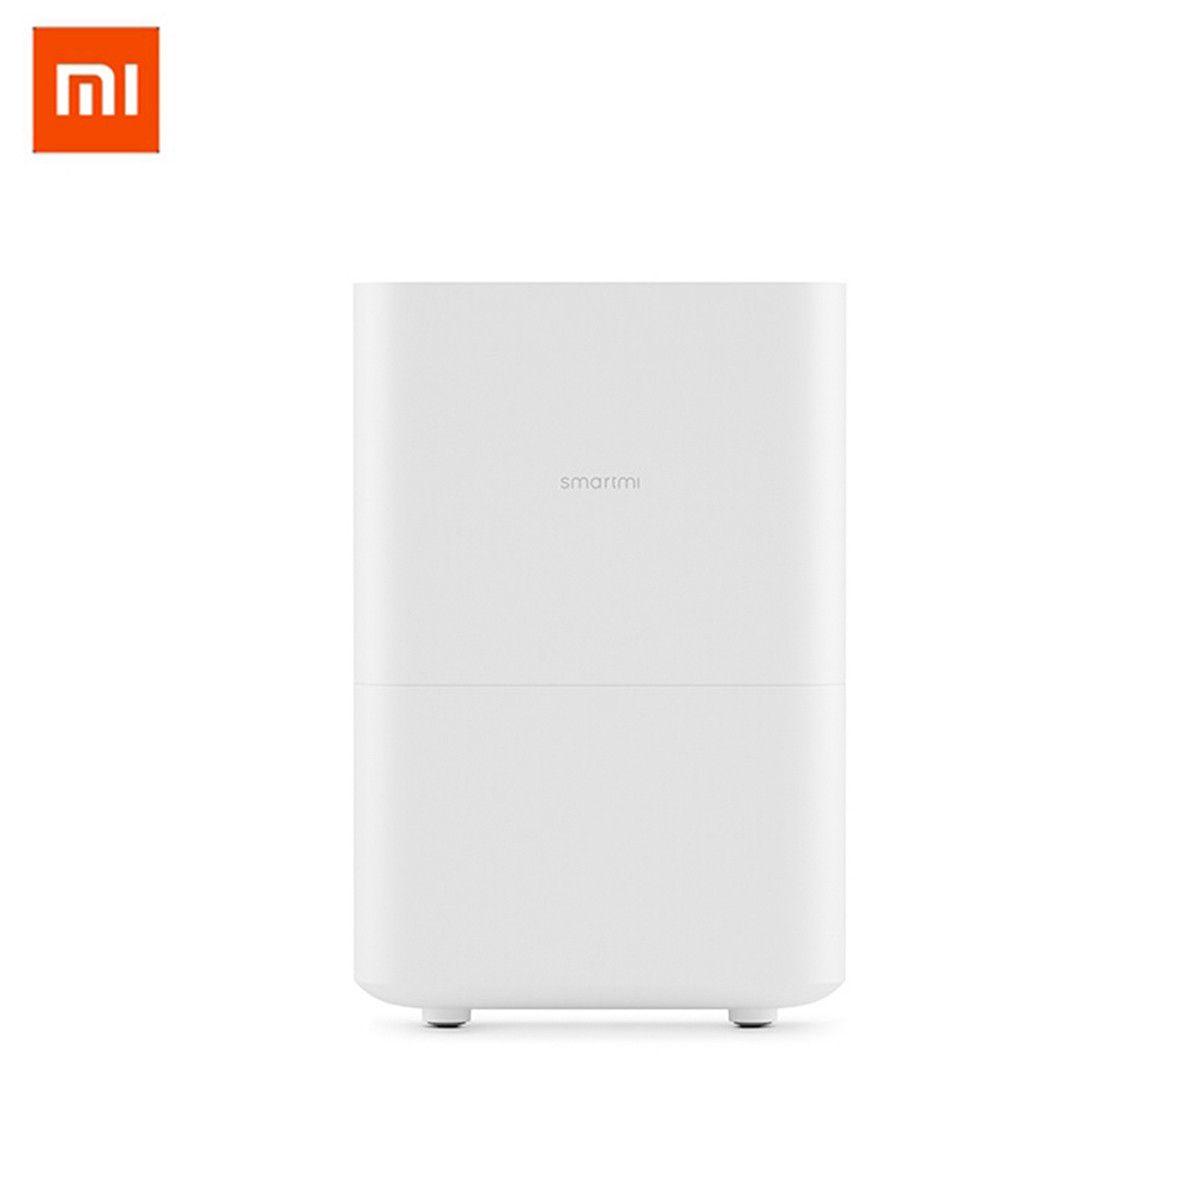 Xiaomi Mijia Original Smartmi Natural Evaporative Pure Humidifier Air dampener Aroma diffuser 4L Water Tank APP Remote Control